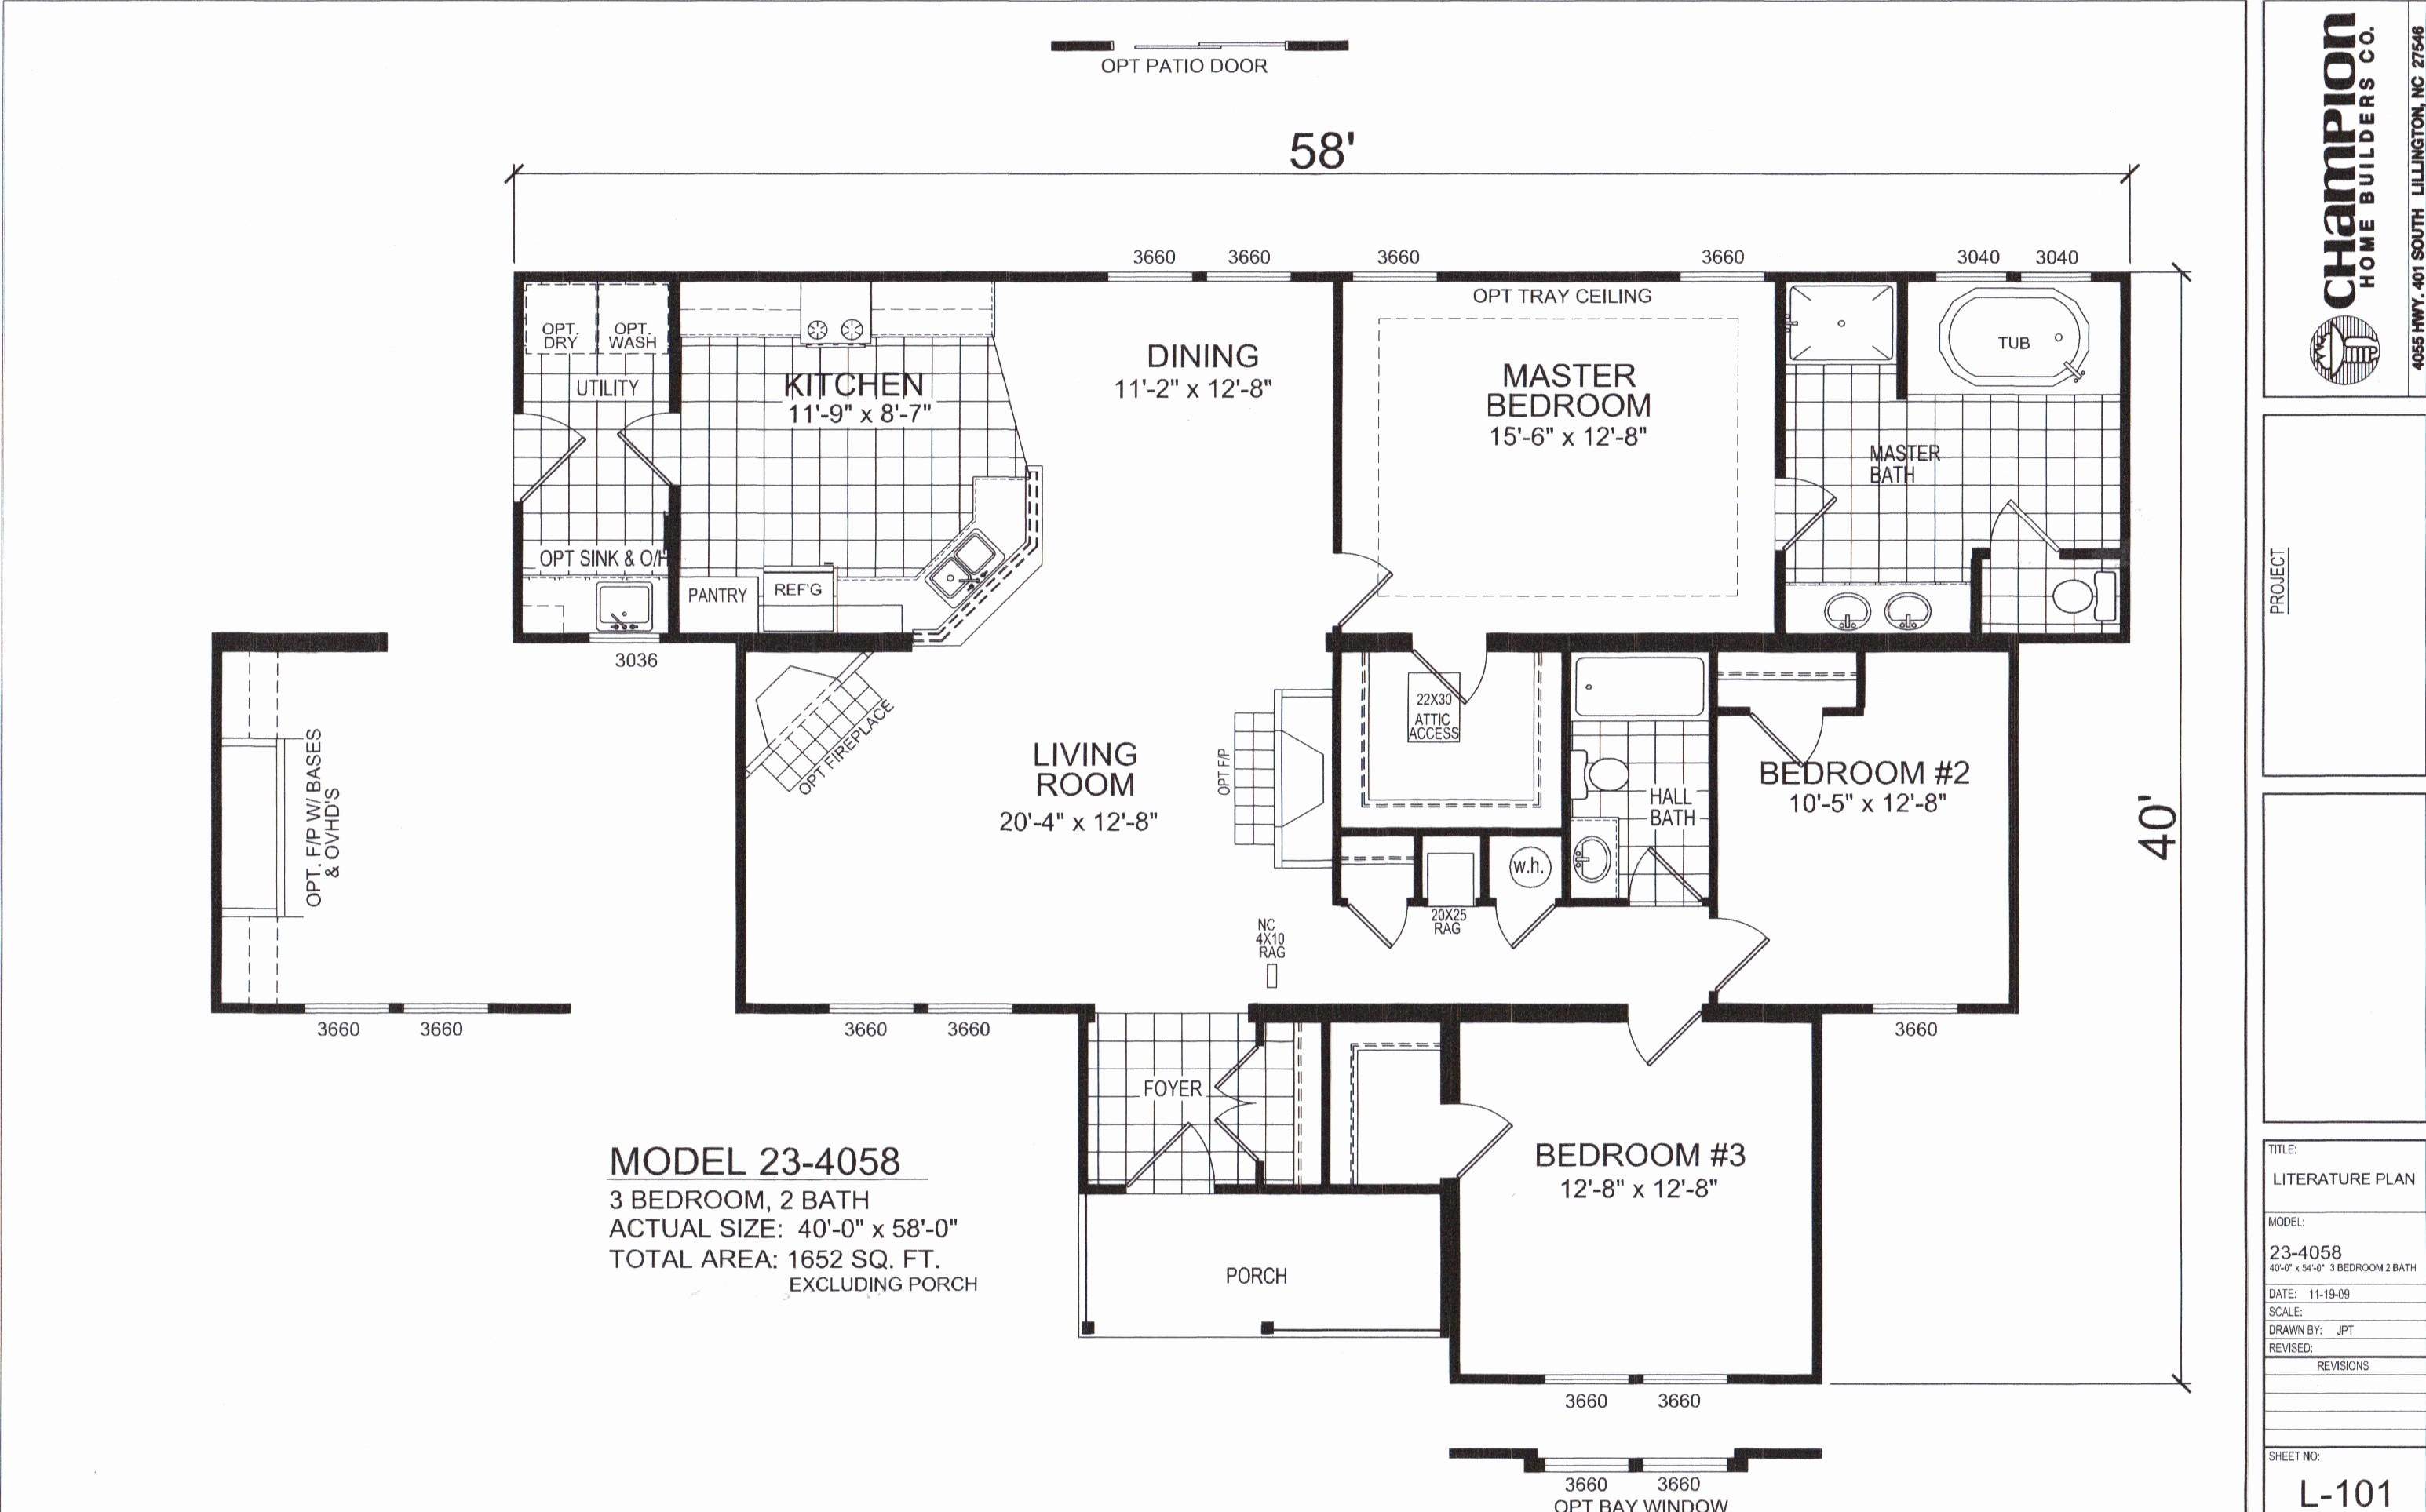 Manufactured Home Wiring Diagram | Wiring Diagram Image on